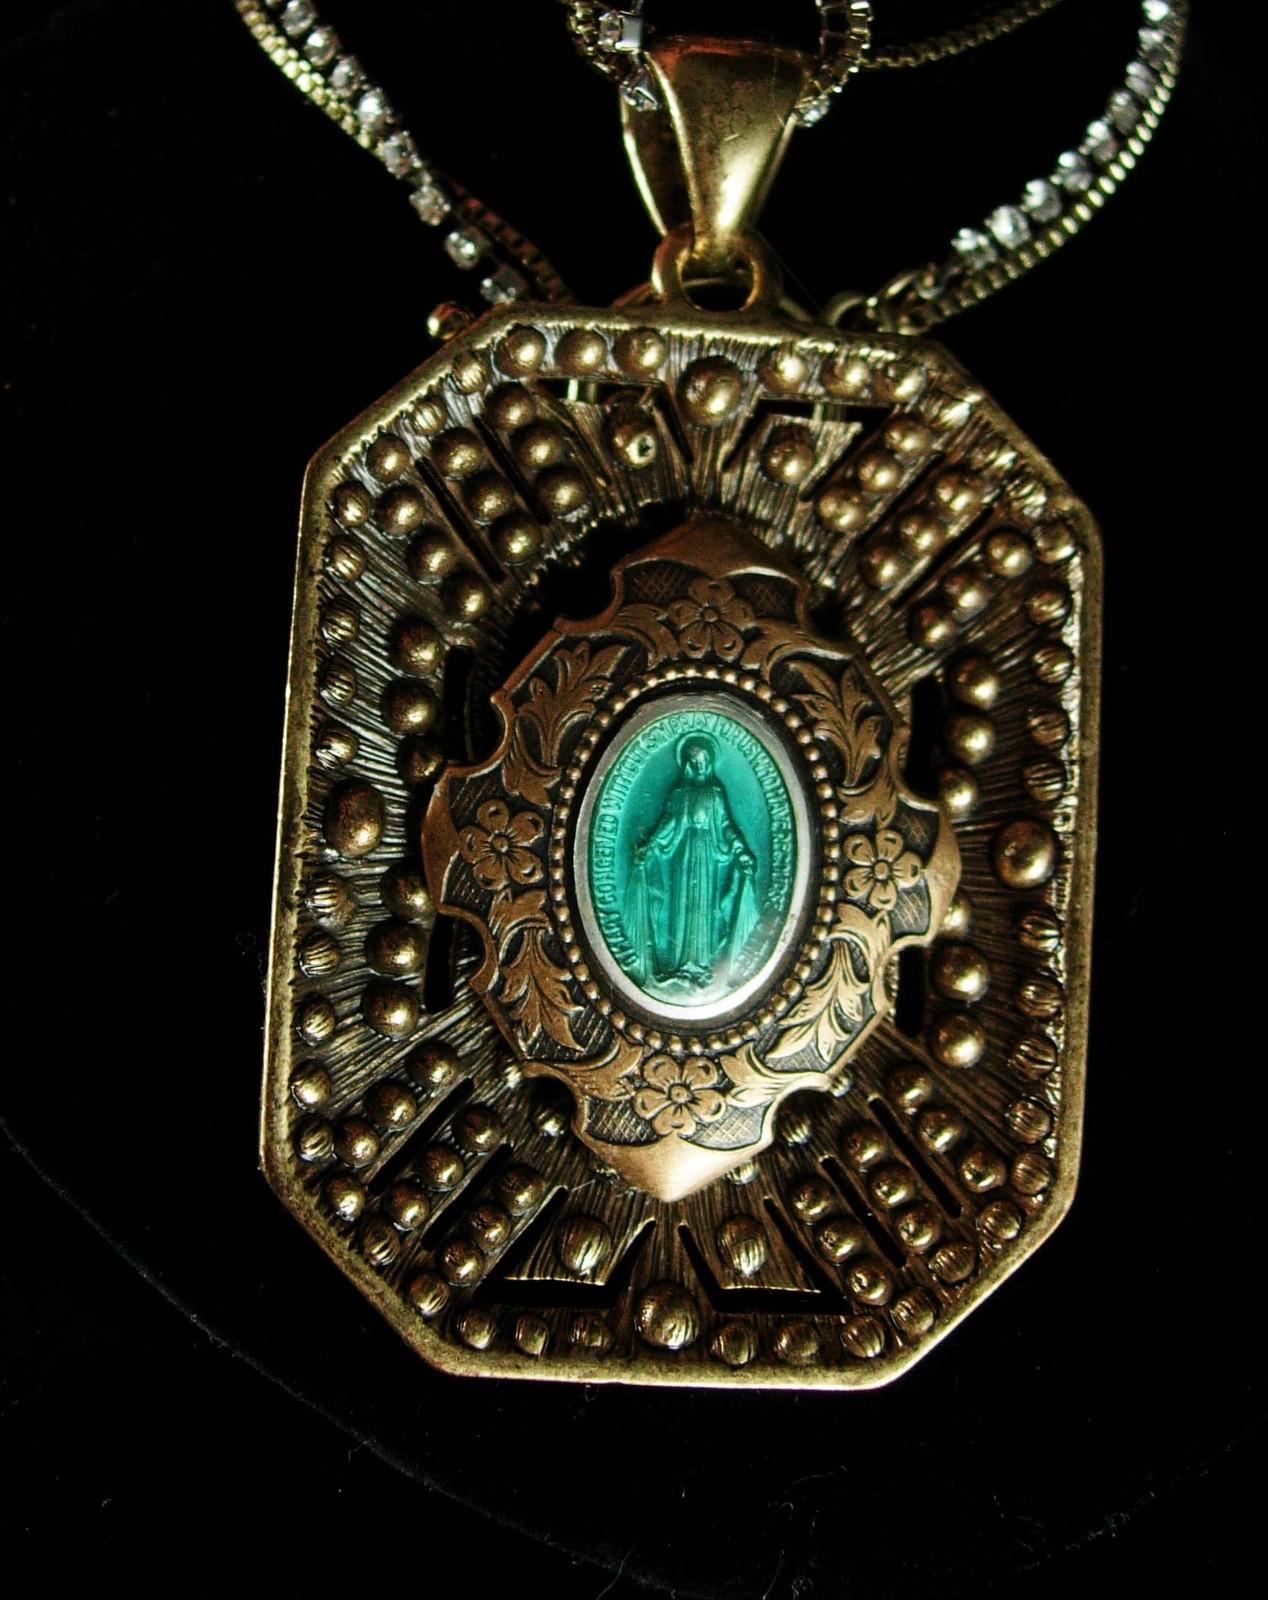 Vintage religious saint necklace vintage deco style for Style retro deco